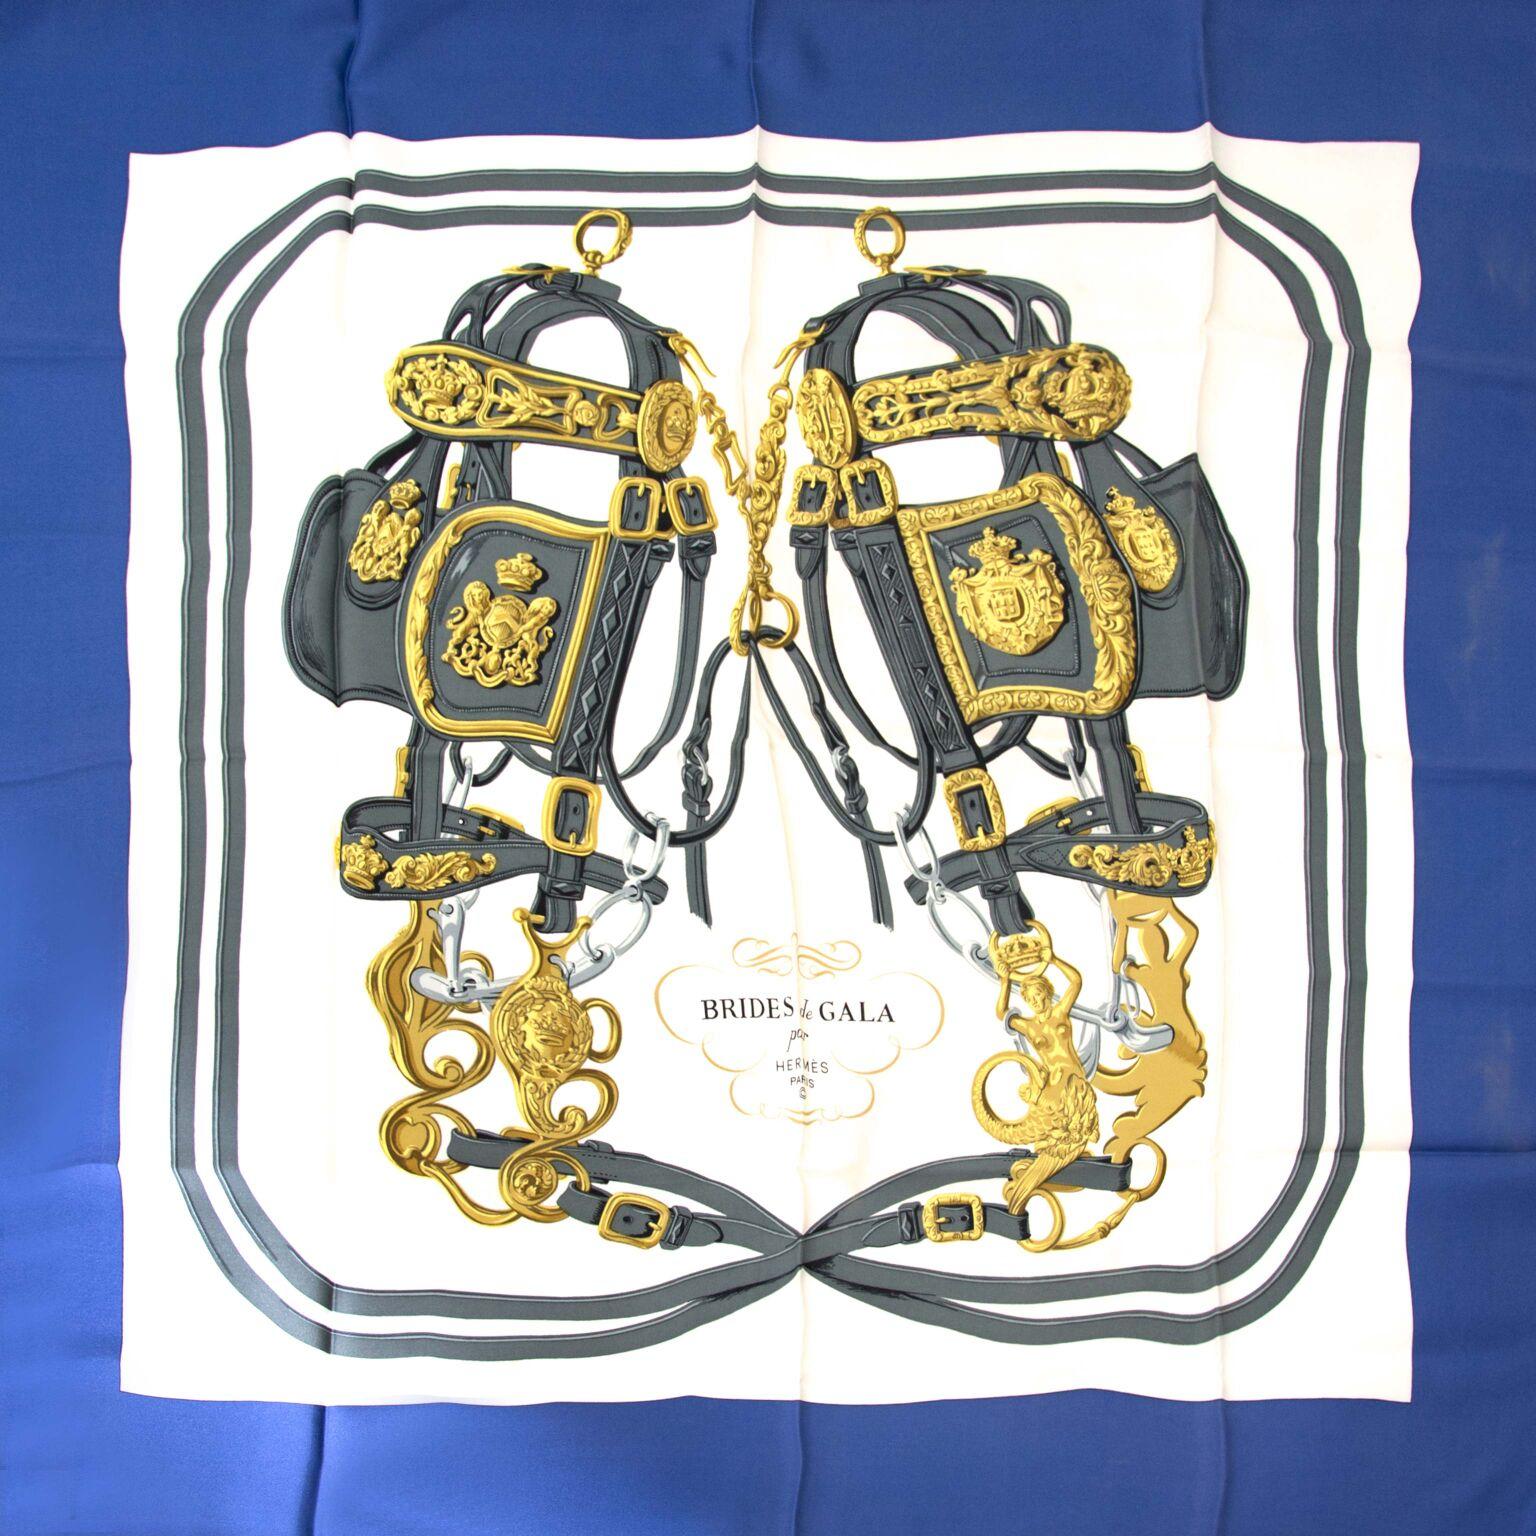 Hermès sjaal te koop op labellov.com